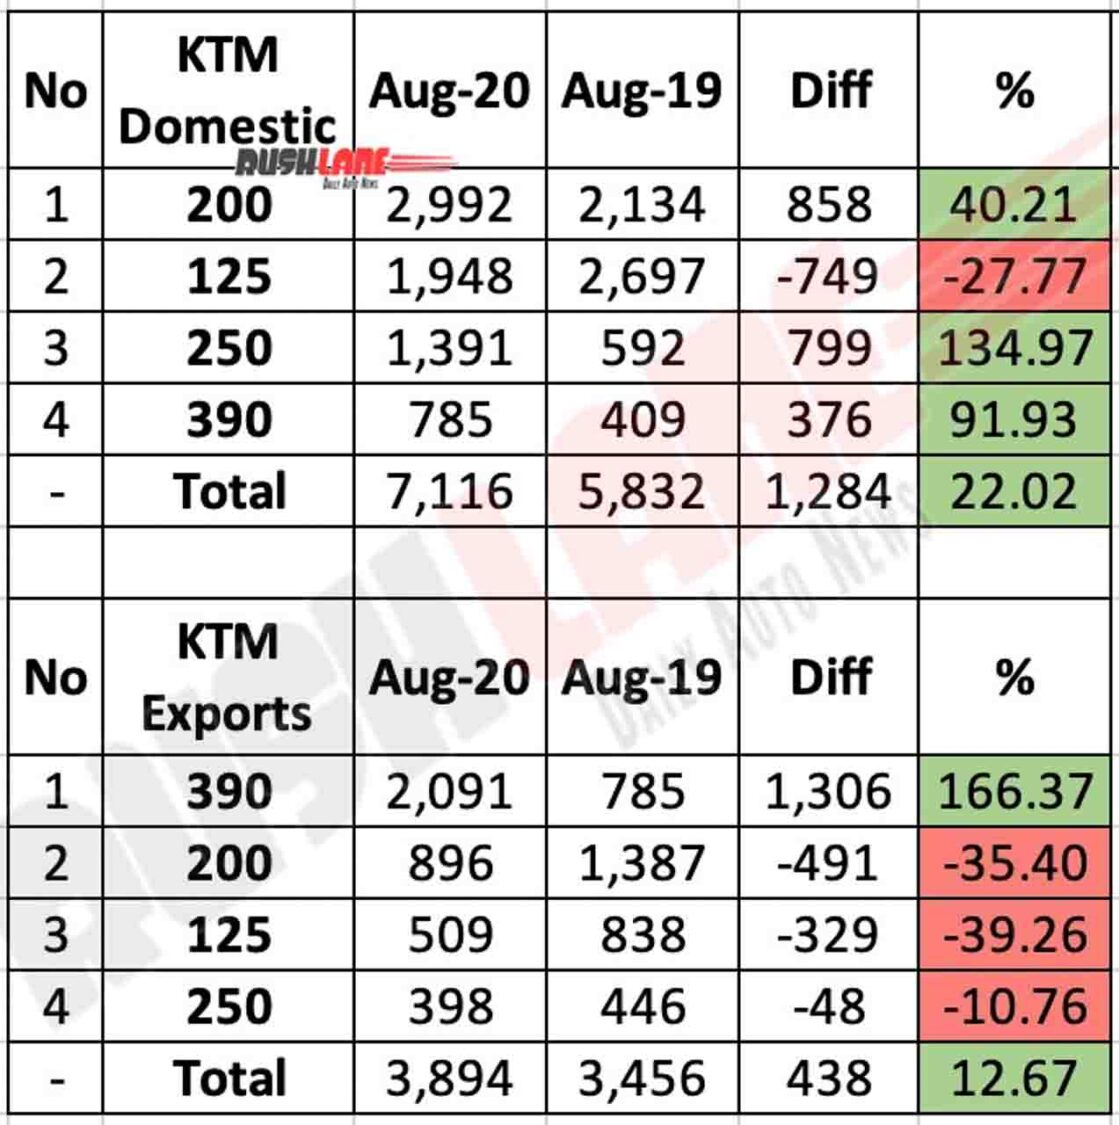 KTM India Sales Aug 2020